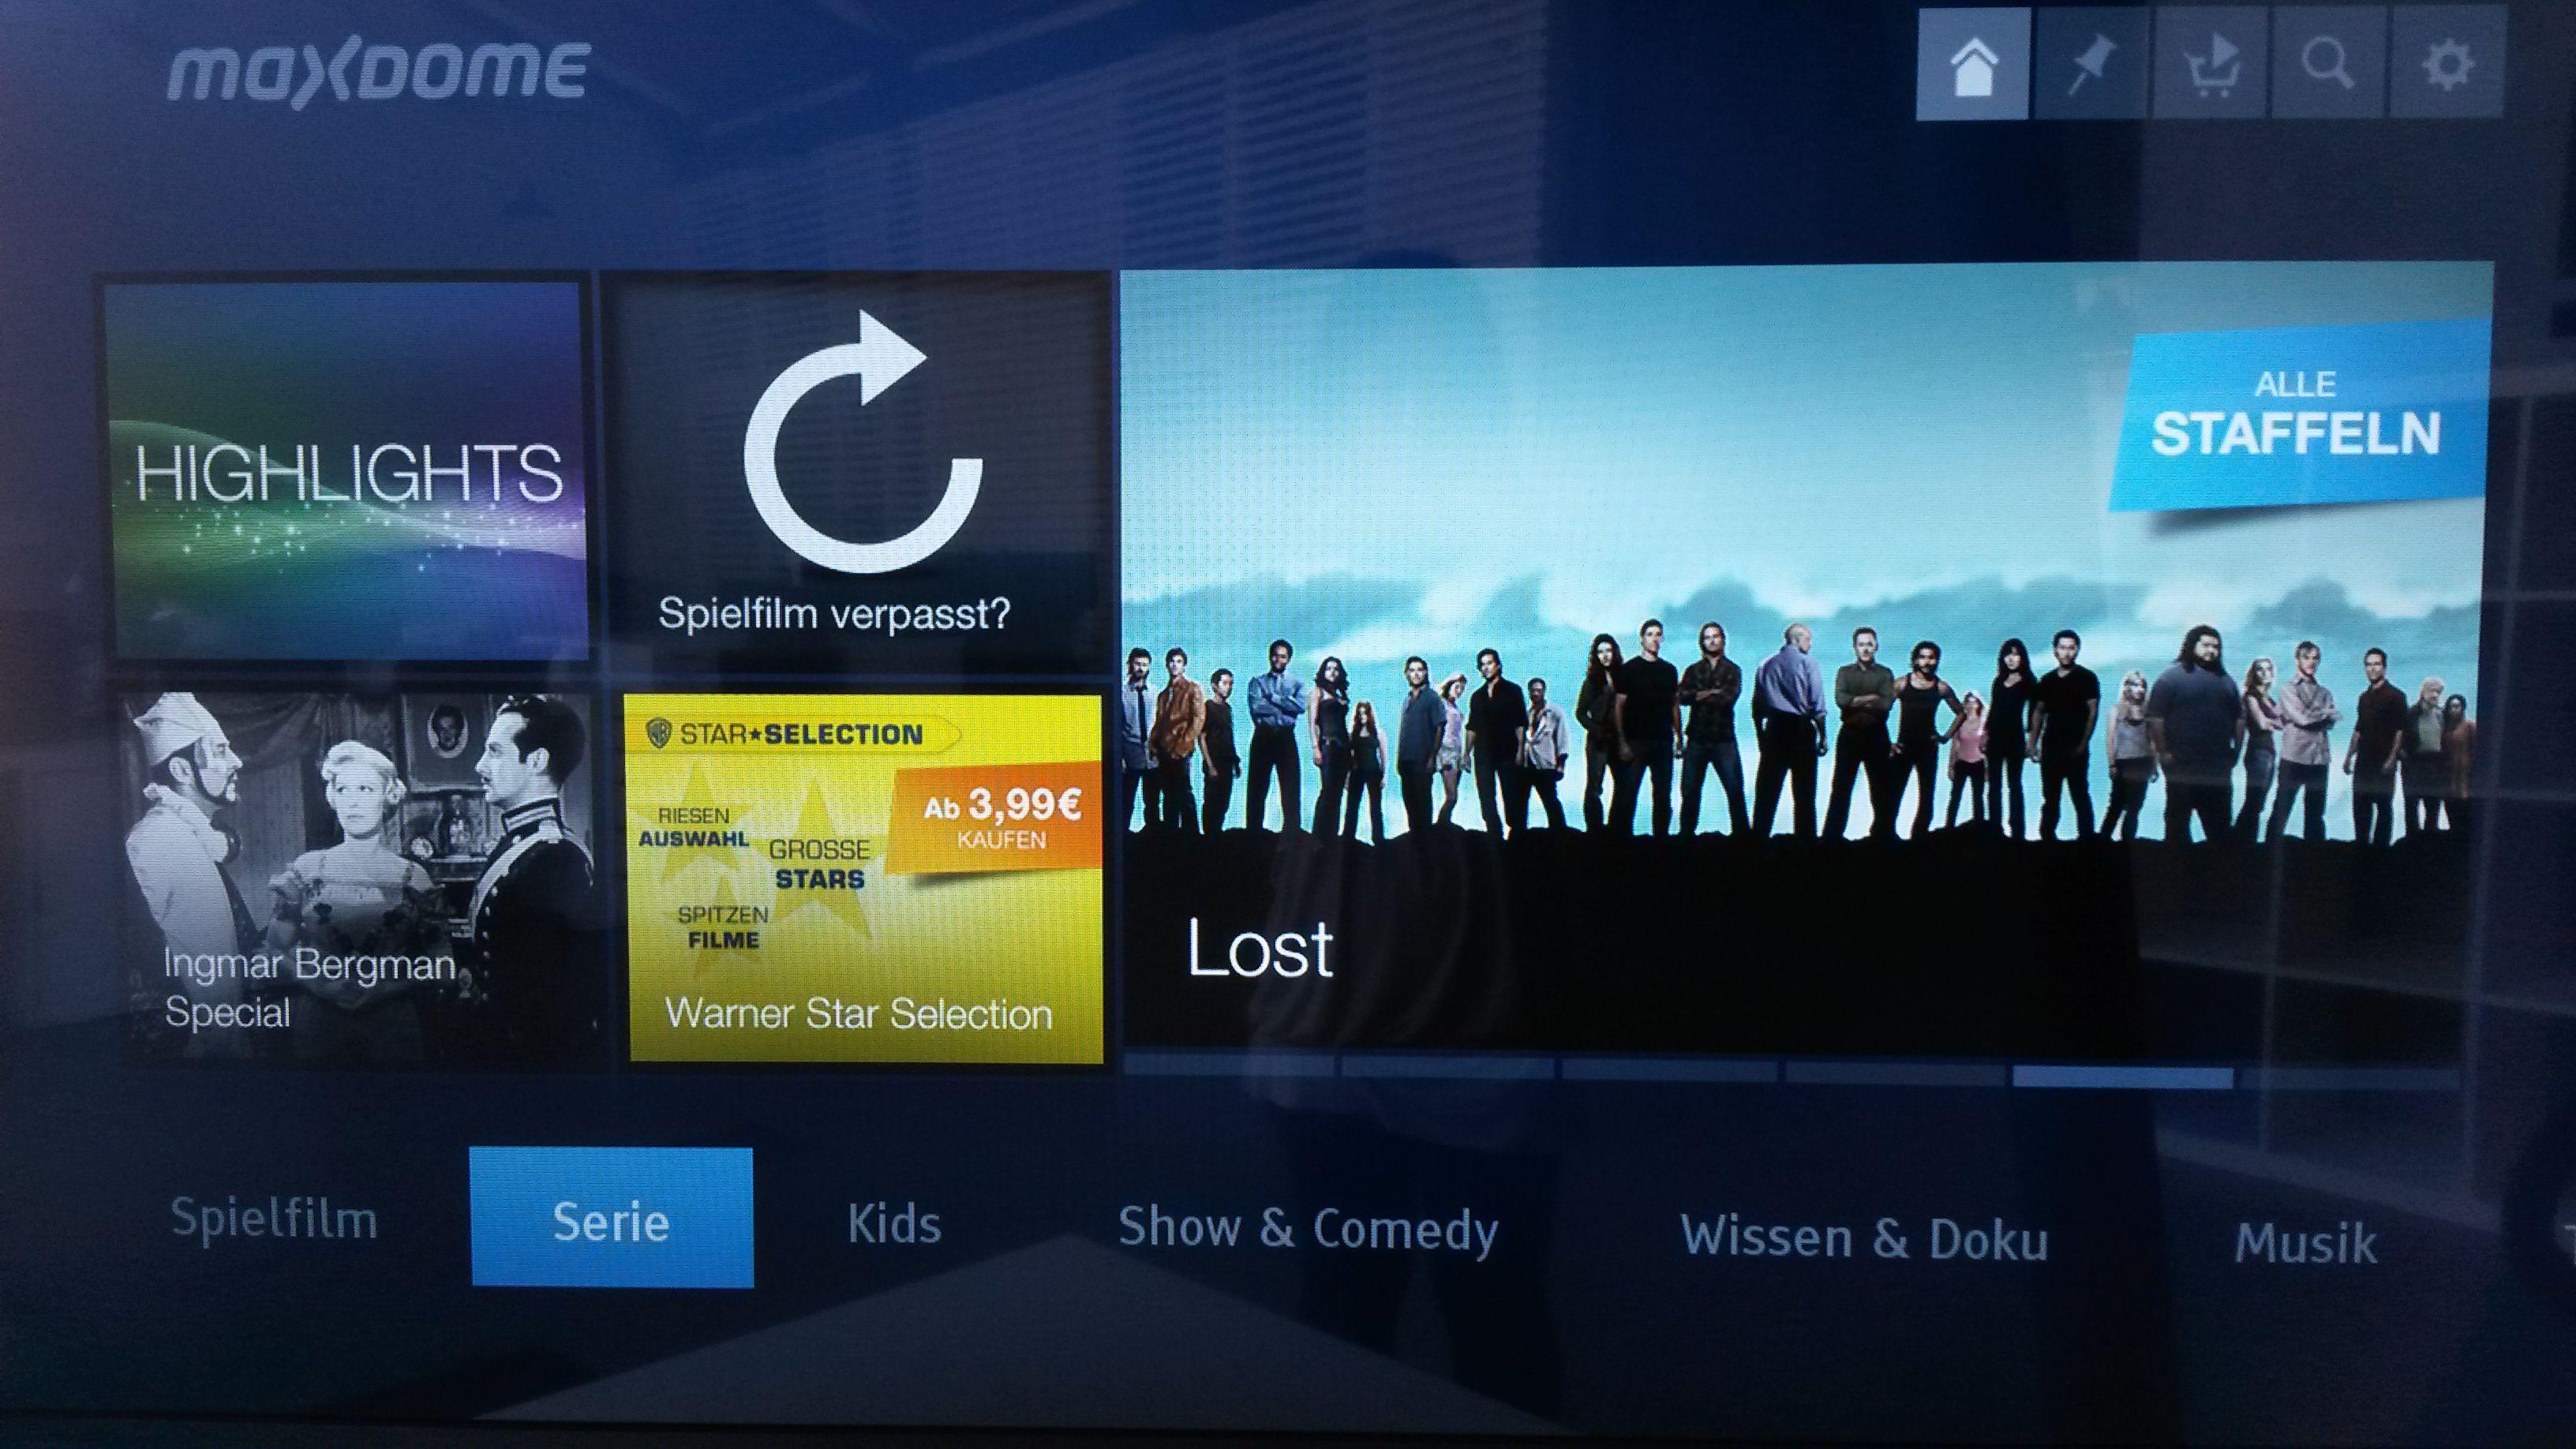 Maxdome LG 2014 Series Übersicht Smart tv, User